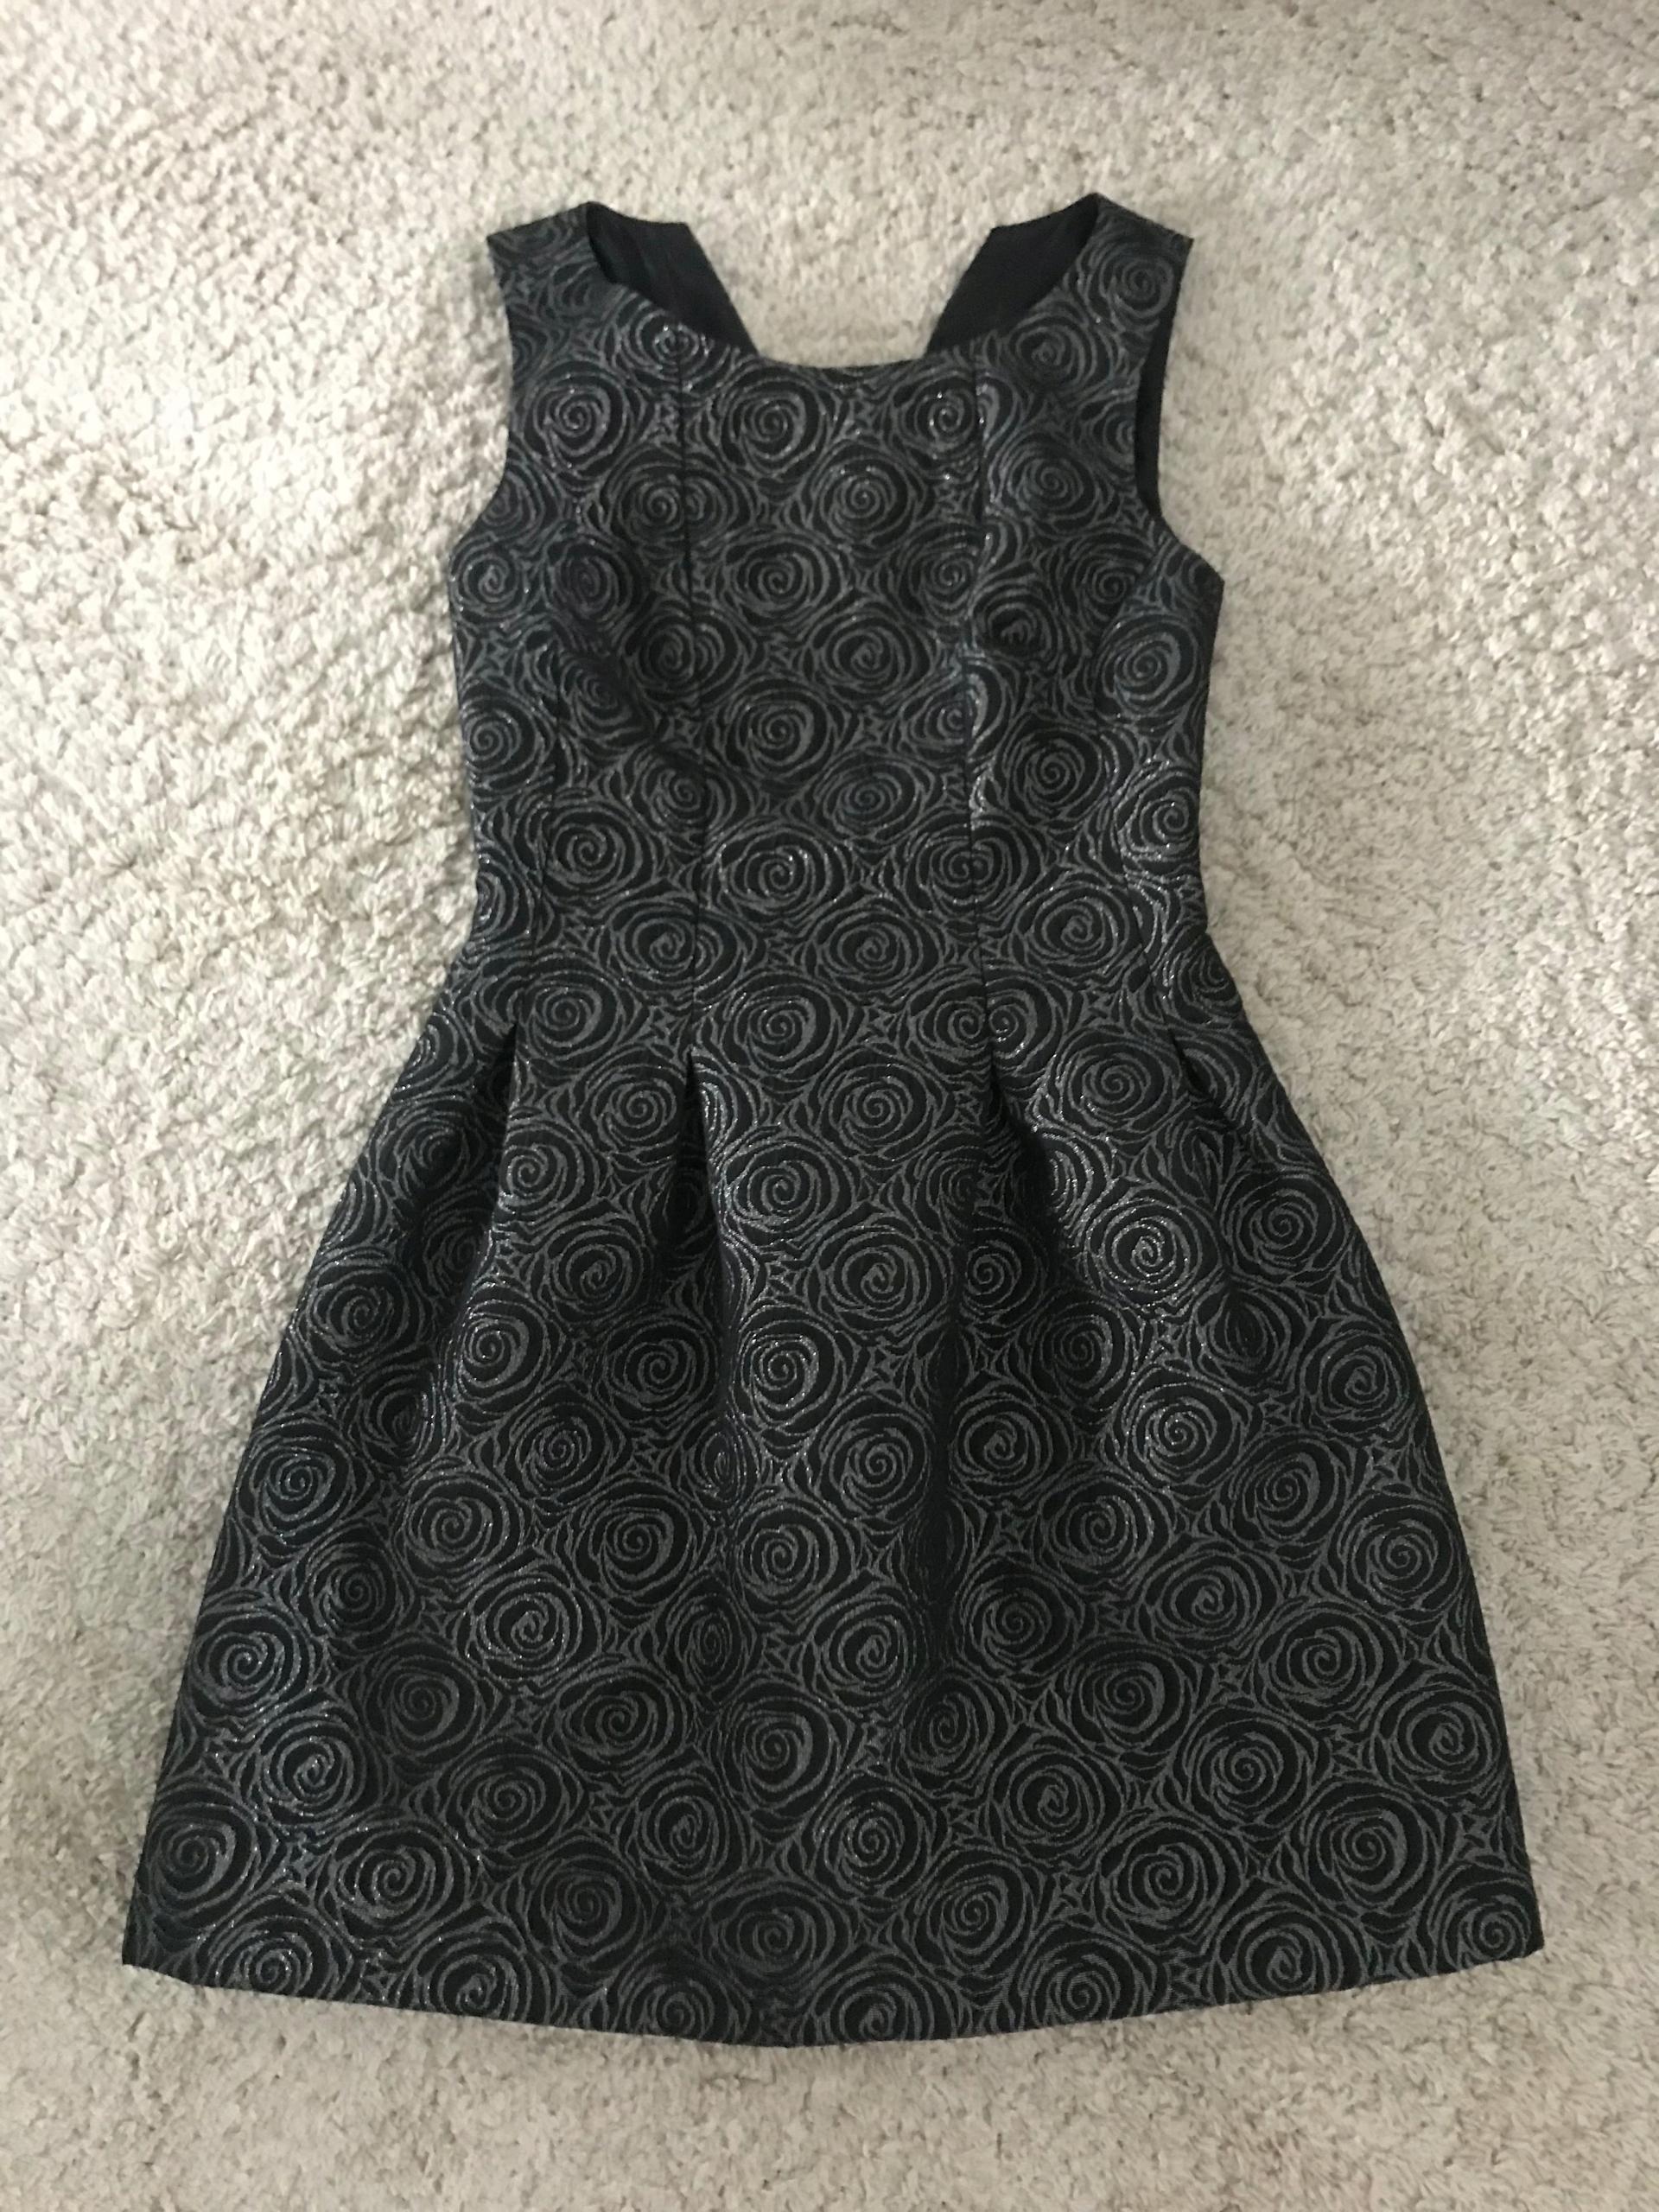 0d34acedd5 Elegancka sukienka PRETTY GIRL M 38 - 7460798033 - oficjalne ...